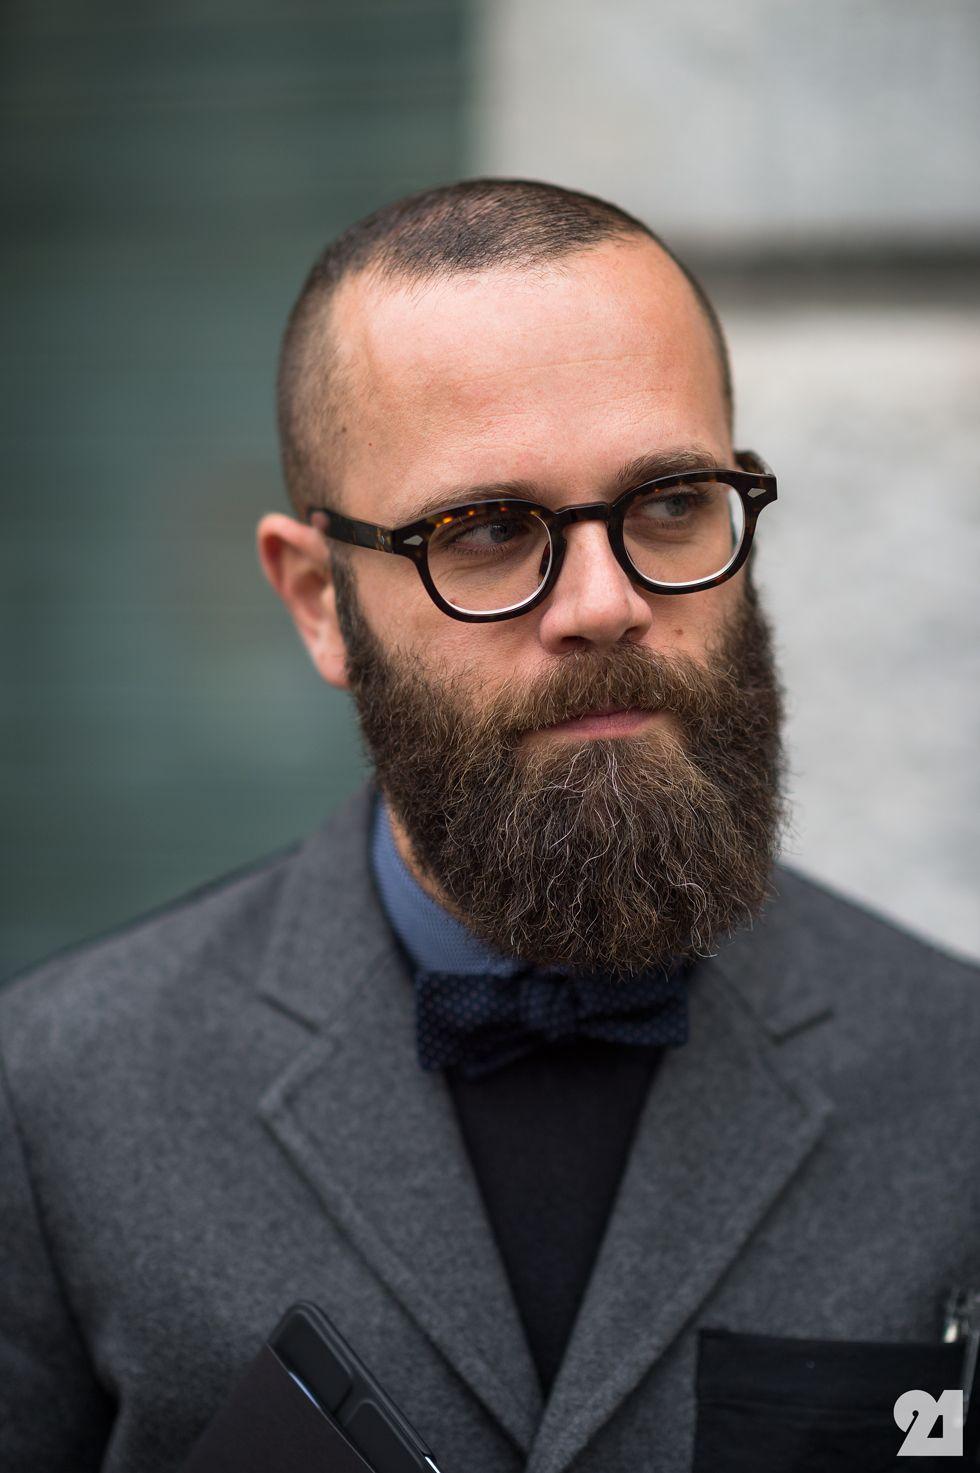 Glasses stylish for bald men fotos